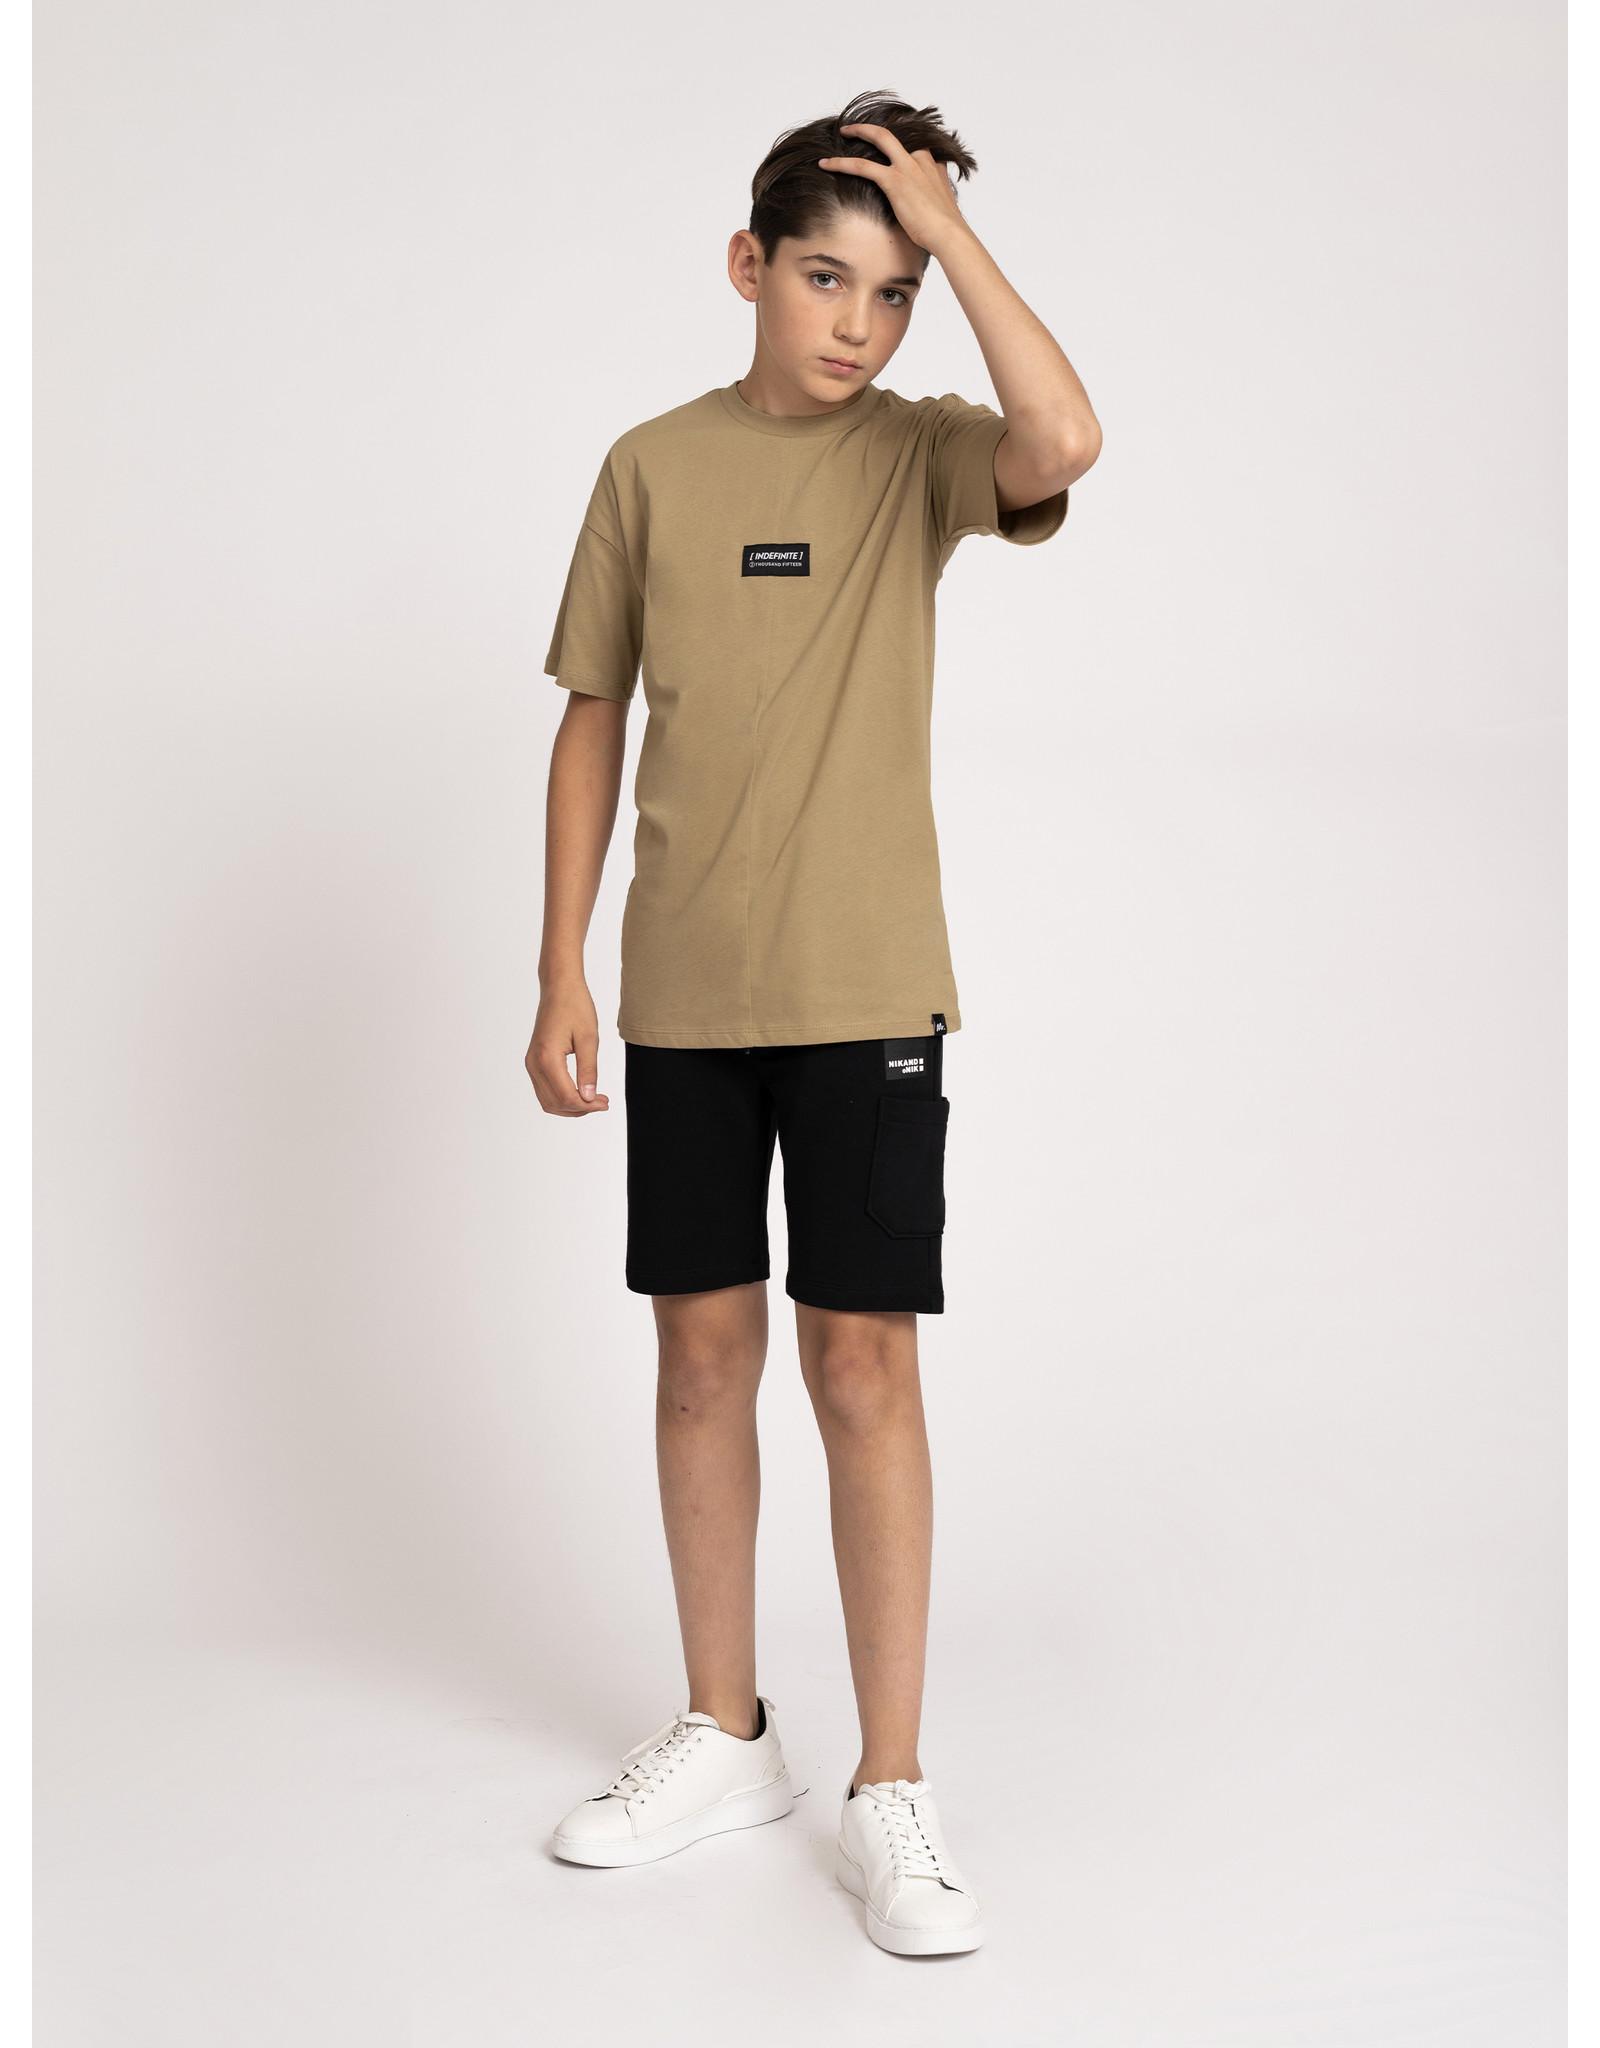 Nik&Nik NIK&NIK  Austin T-Shirt Clay Beige